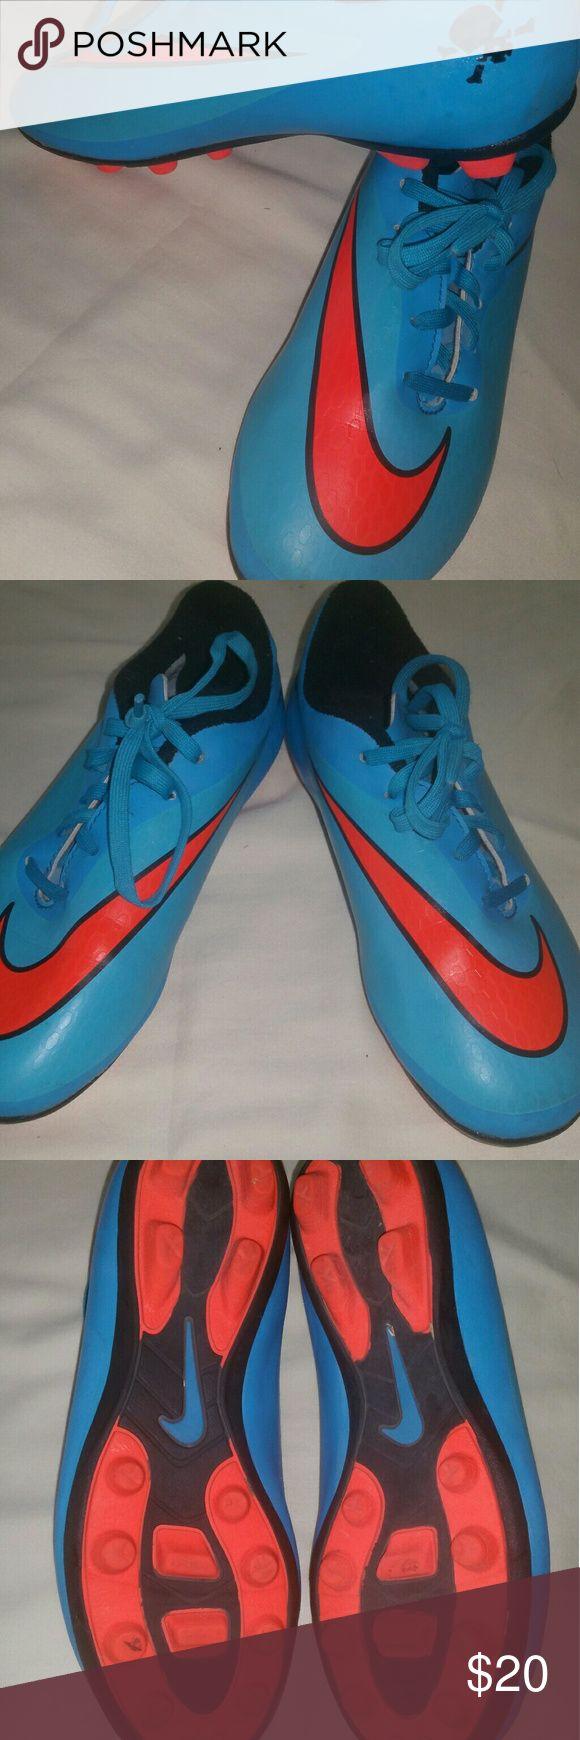 Nike youth football cleats Never worn cleats. NIKE boys shoe. Nike Shoes Sneakers